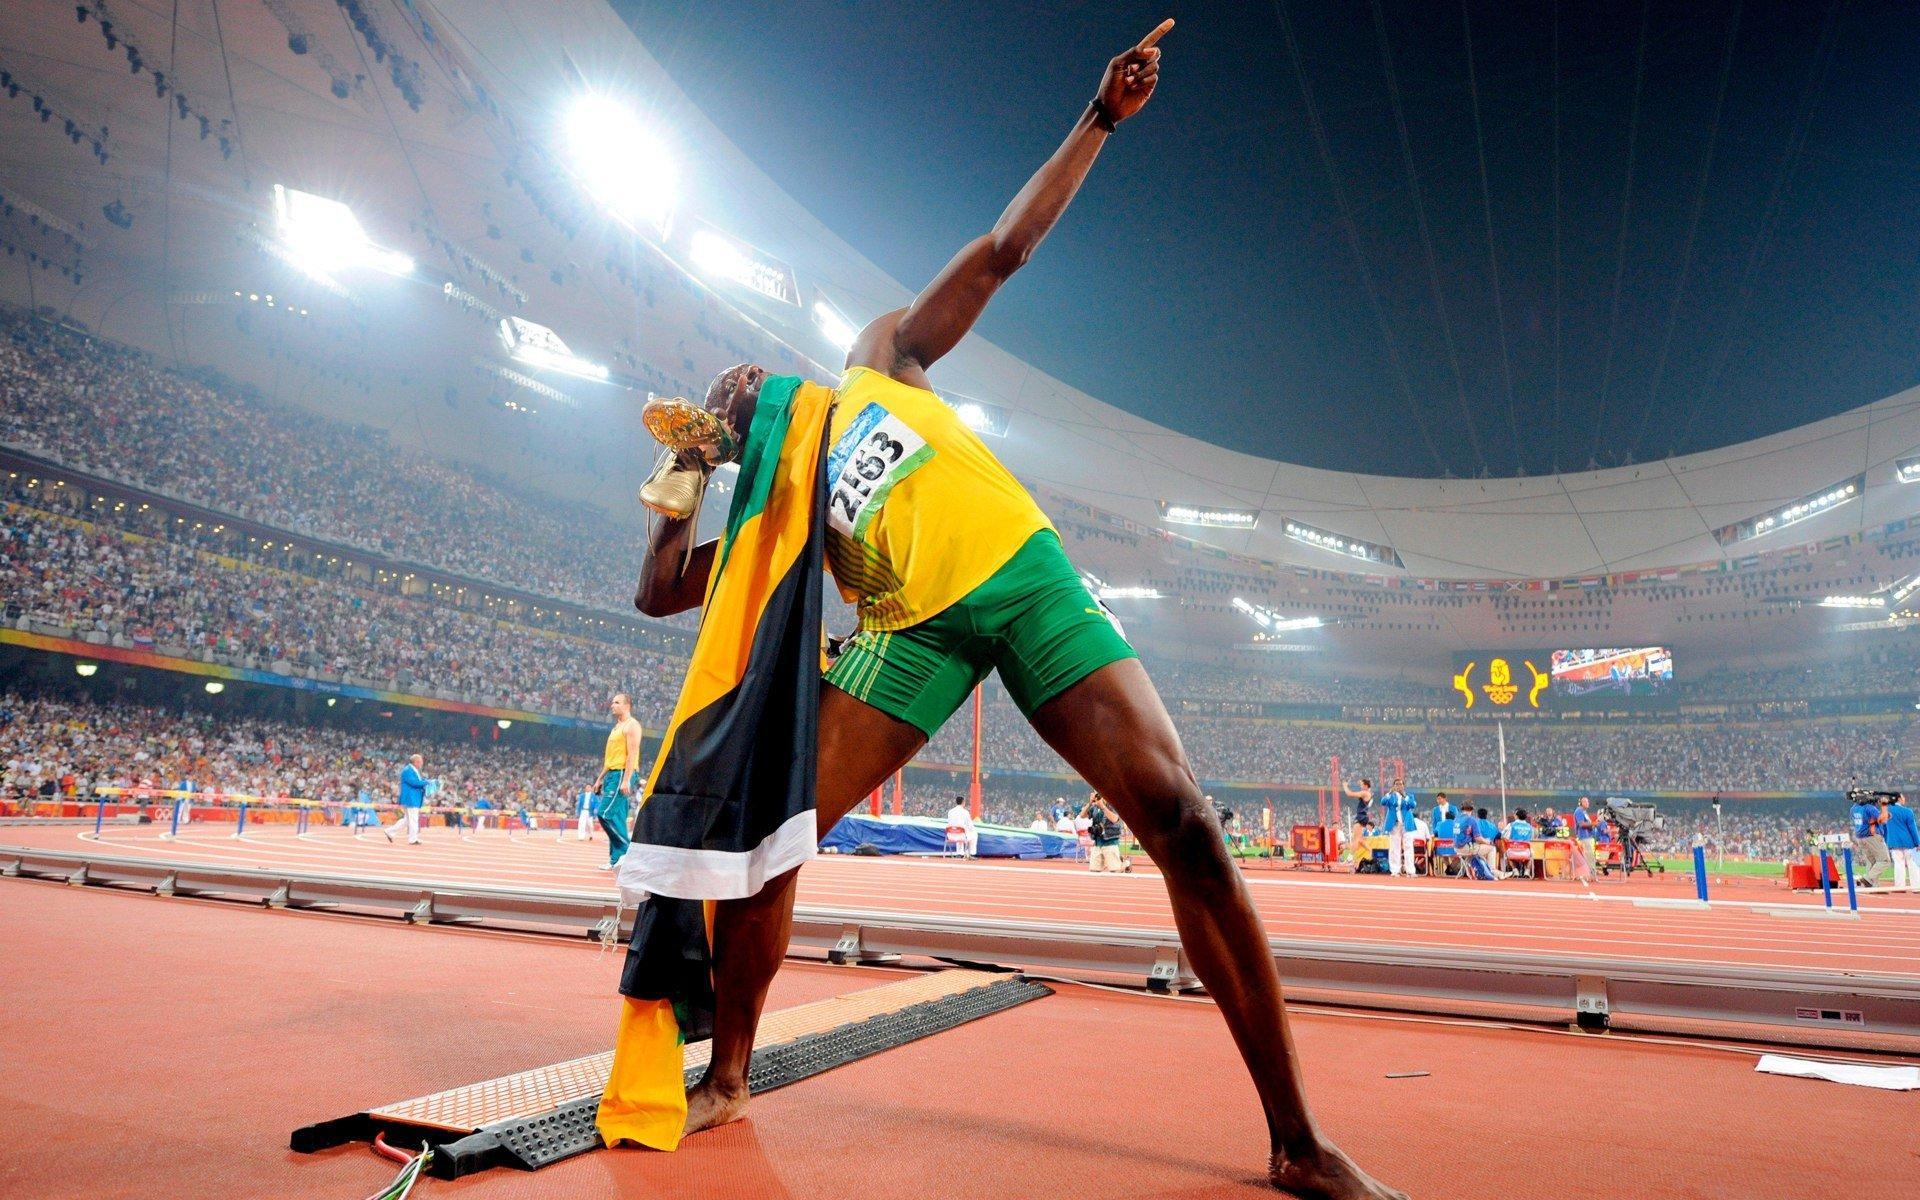 Deporte - Usain Bolt  Lj Handfield Fondo de Pantalla